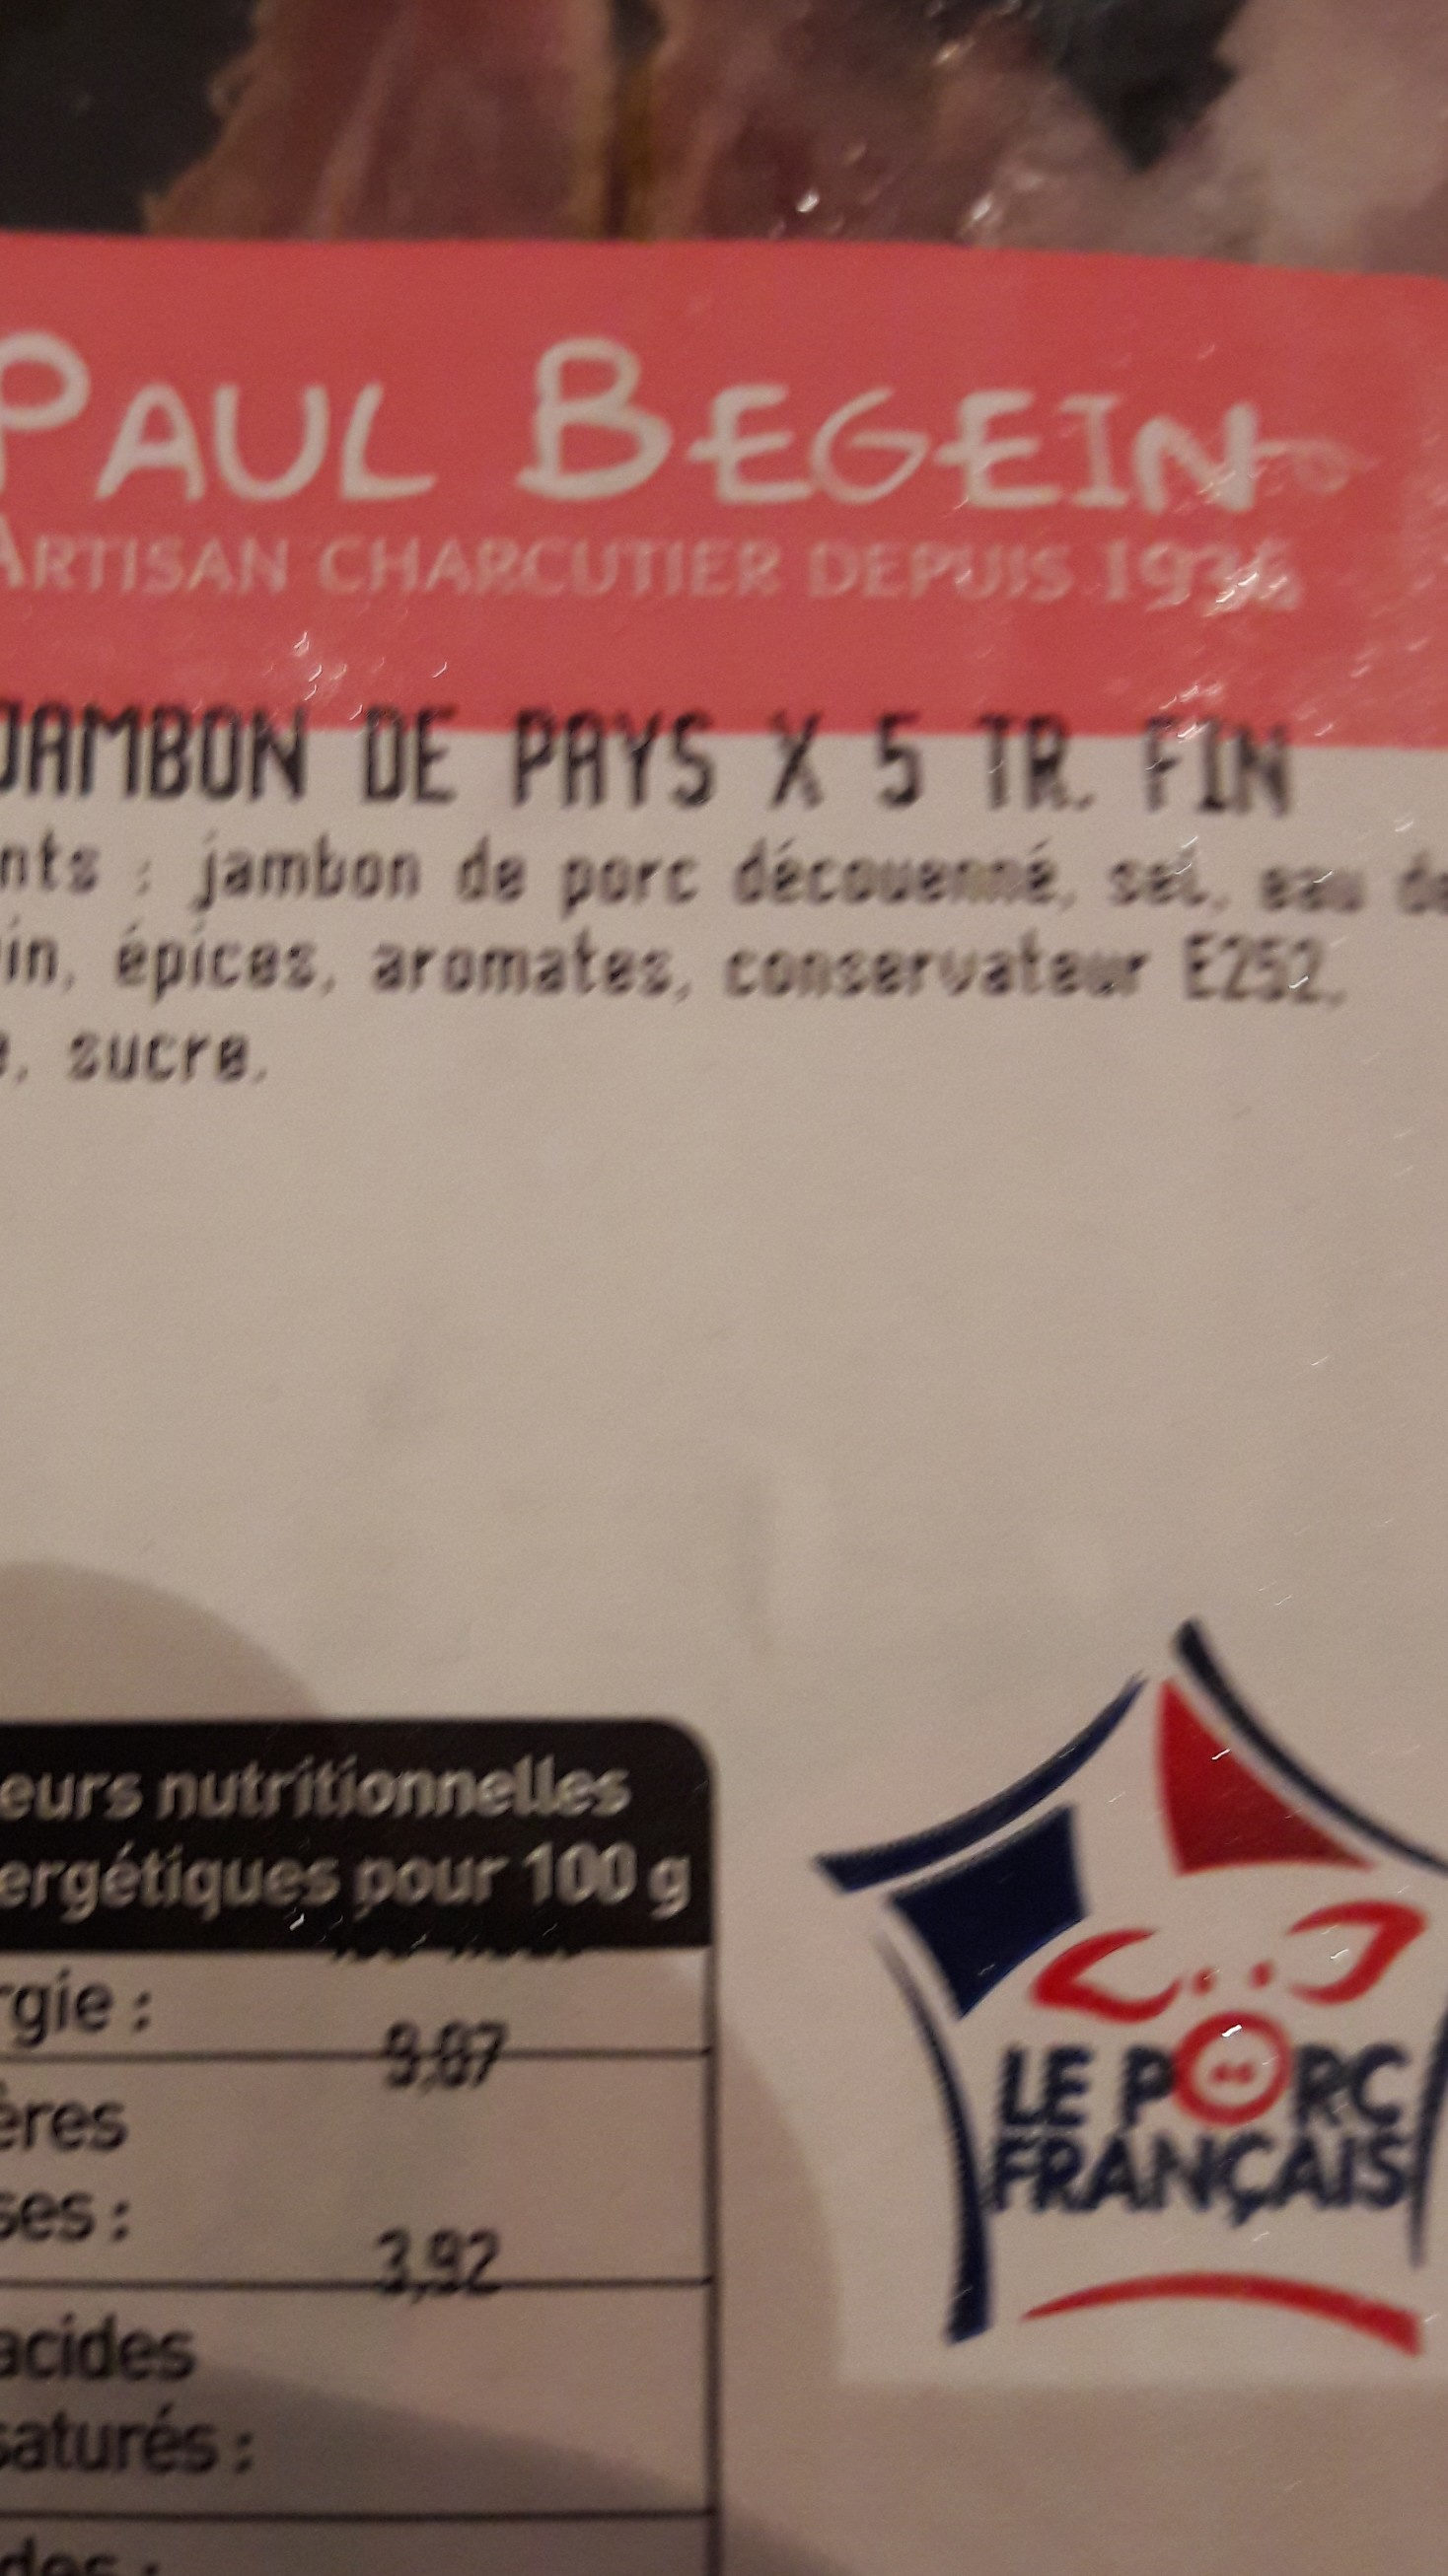 jambon de pays  x 5 tr.fin - Ingredients